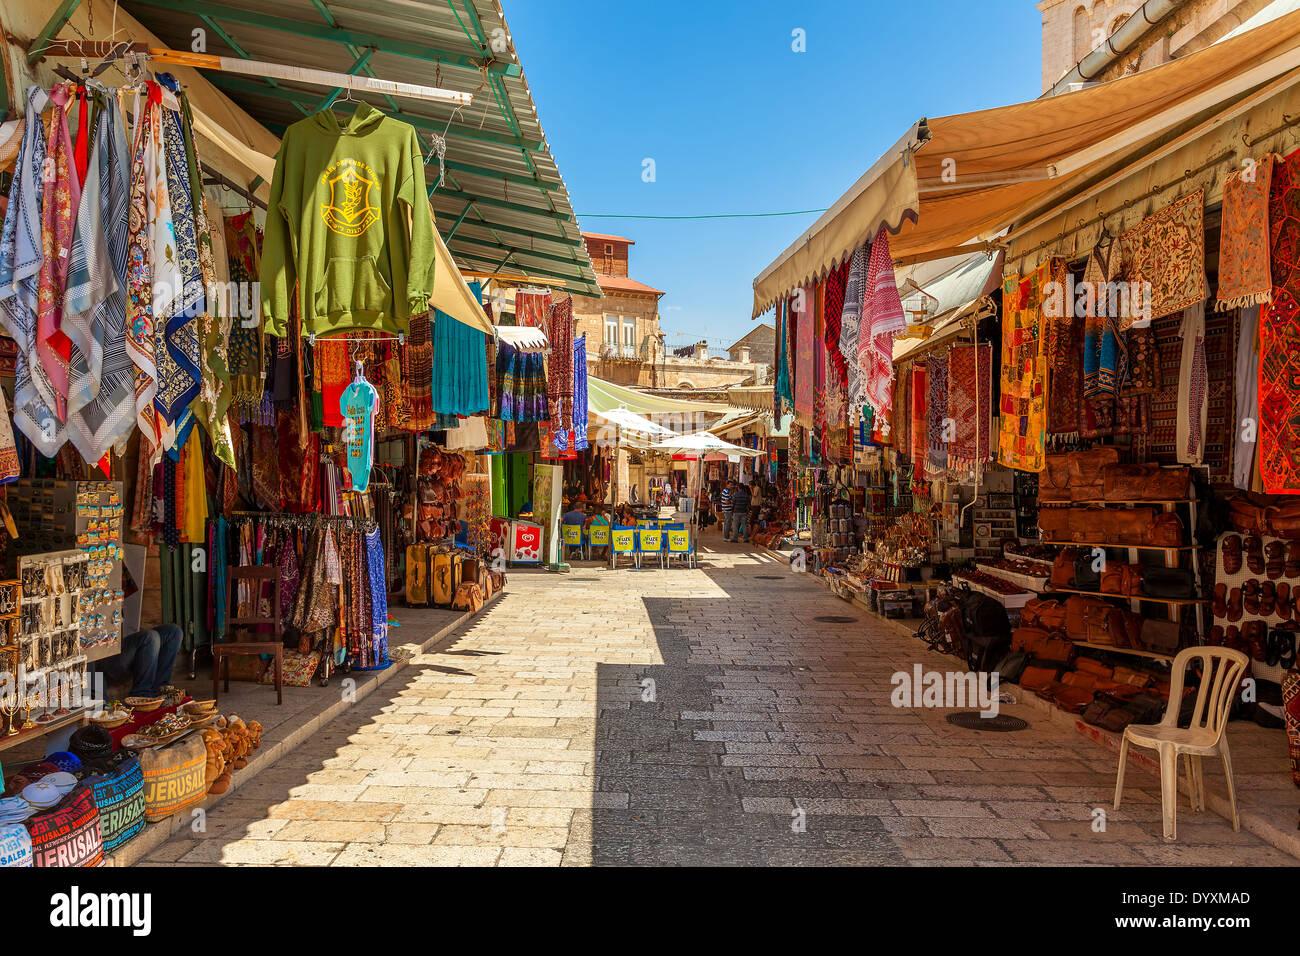 Bazaar in Old City of Jerusalem, Israel. - Stock Image